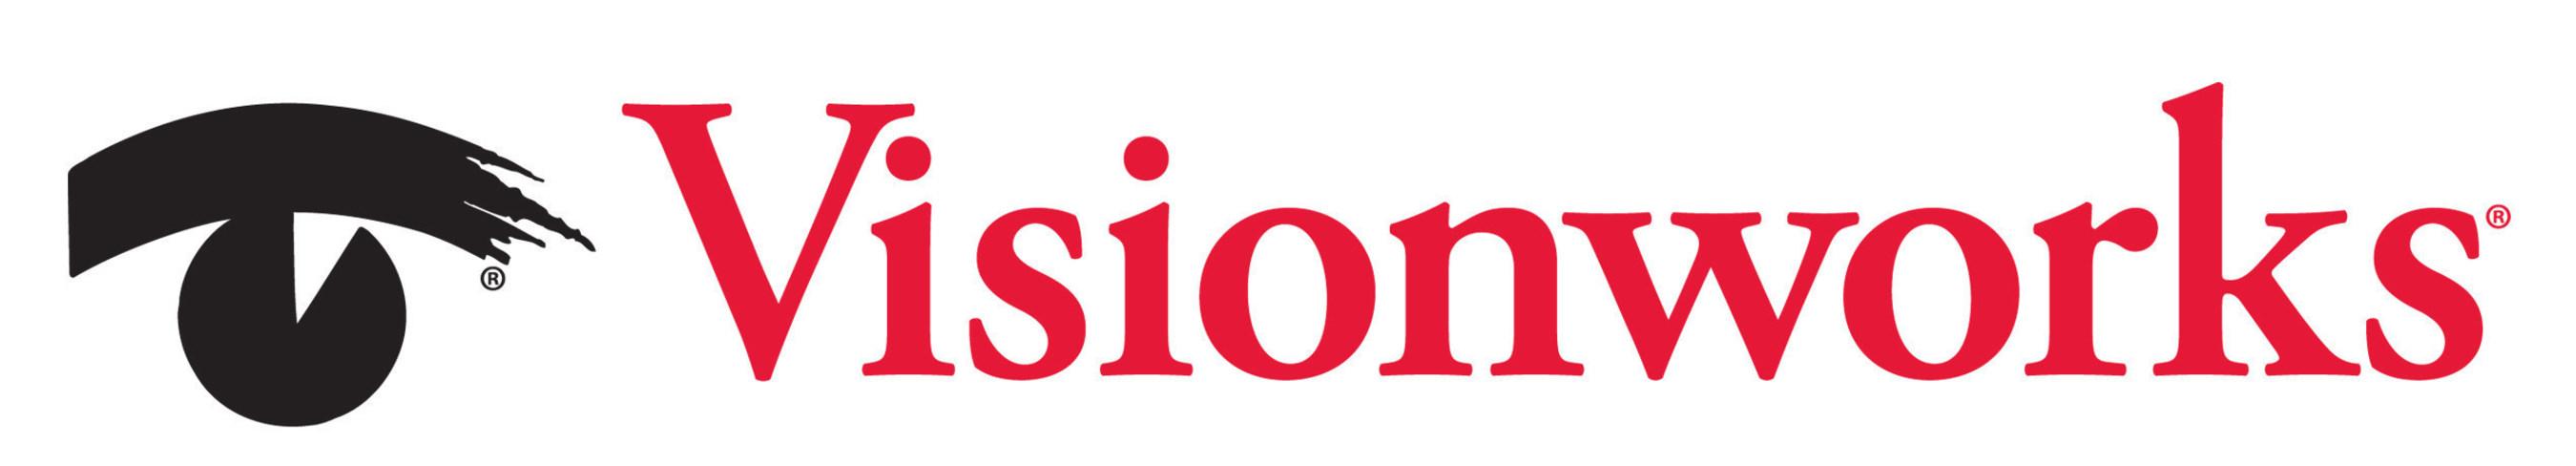 wwwvisionworkscom